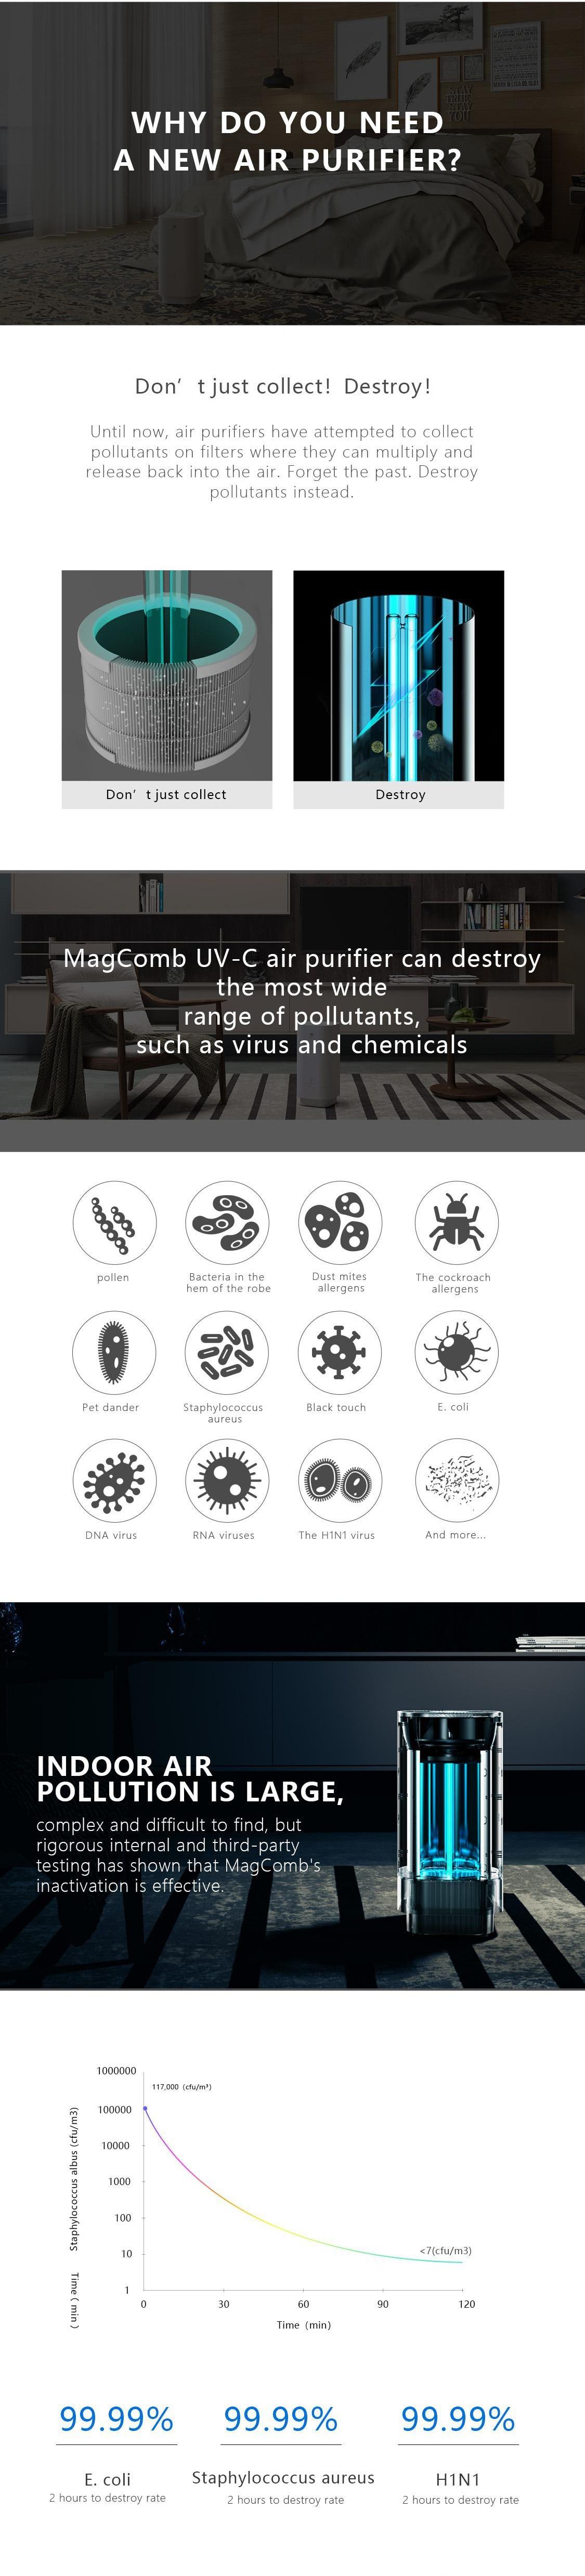 Medical Grade Air Purifier UV-C Disinfection